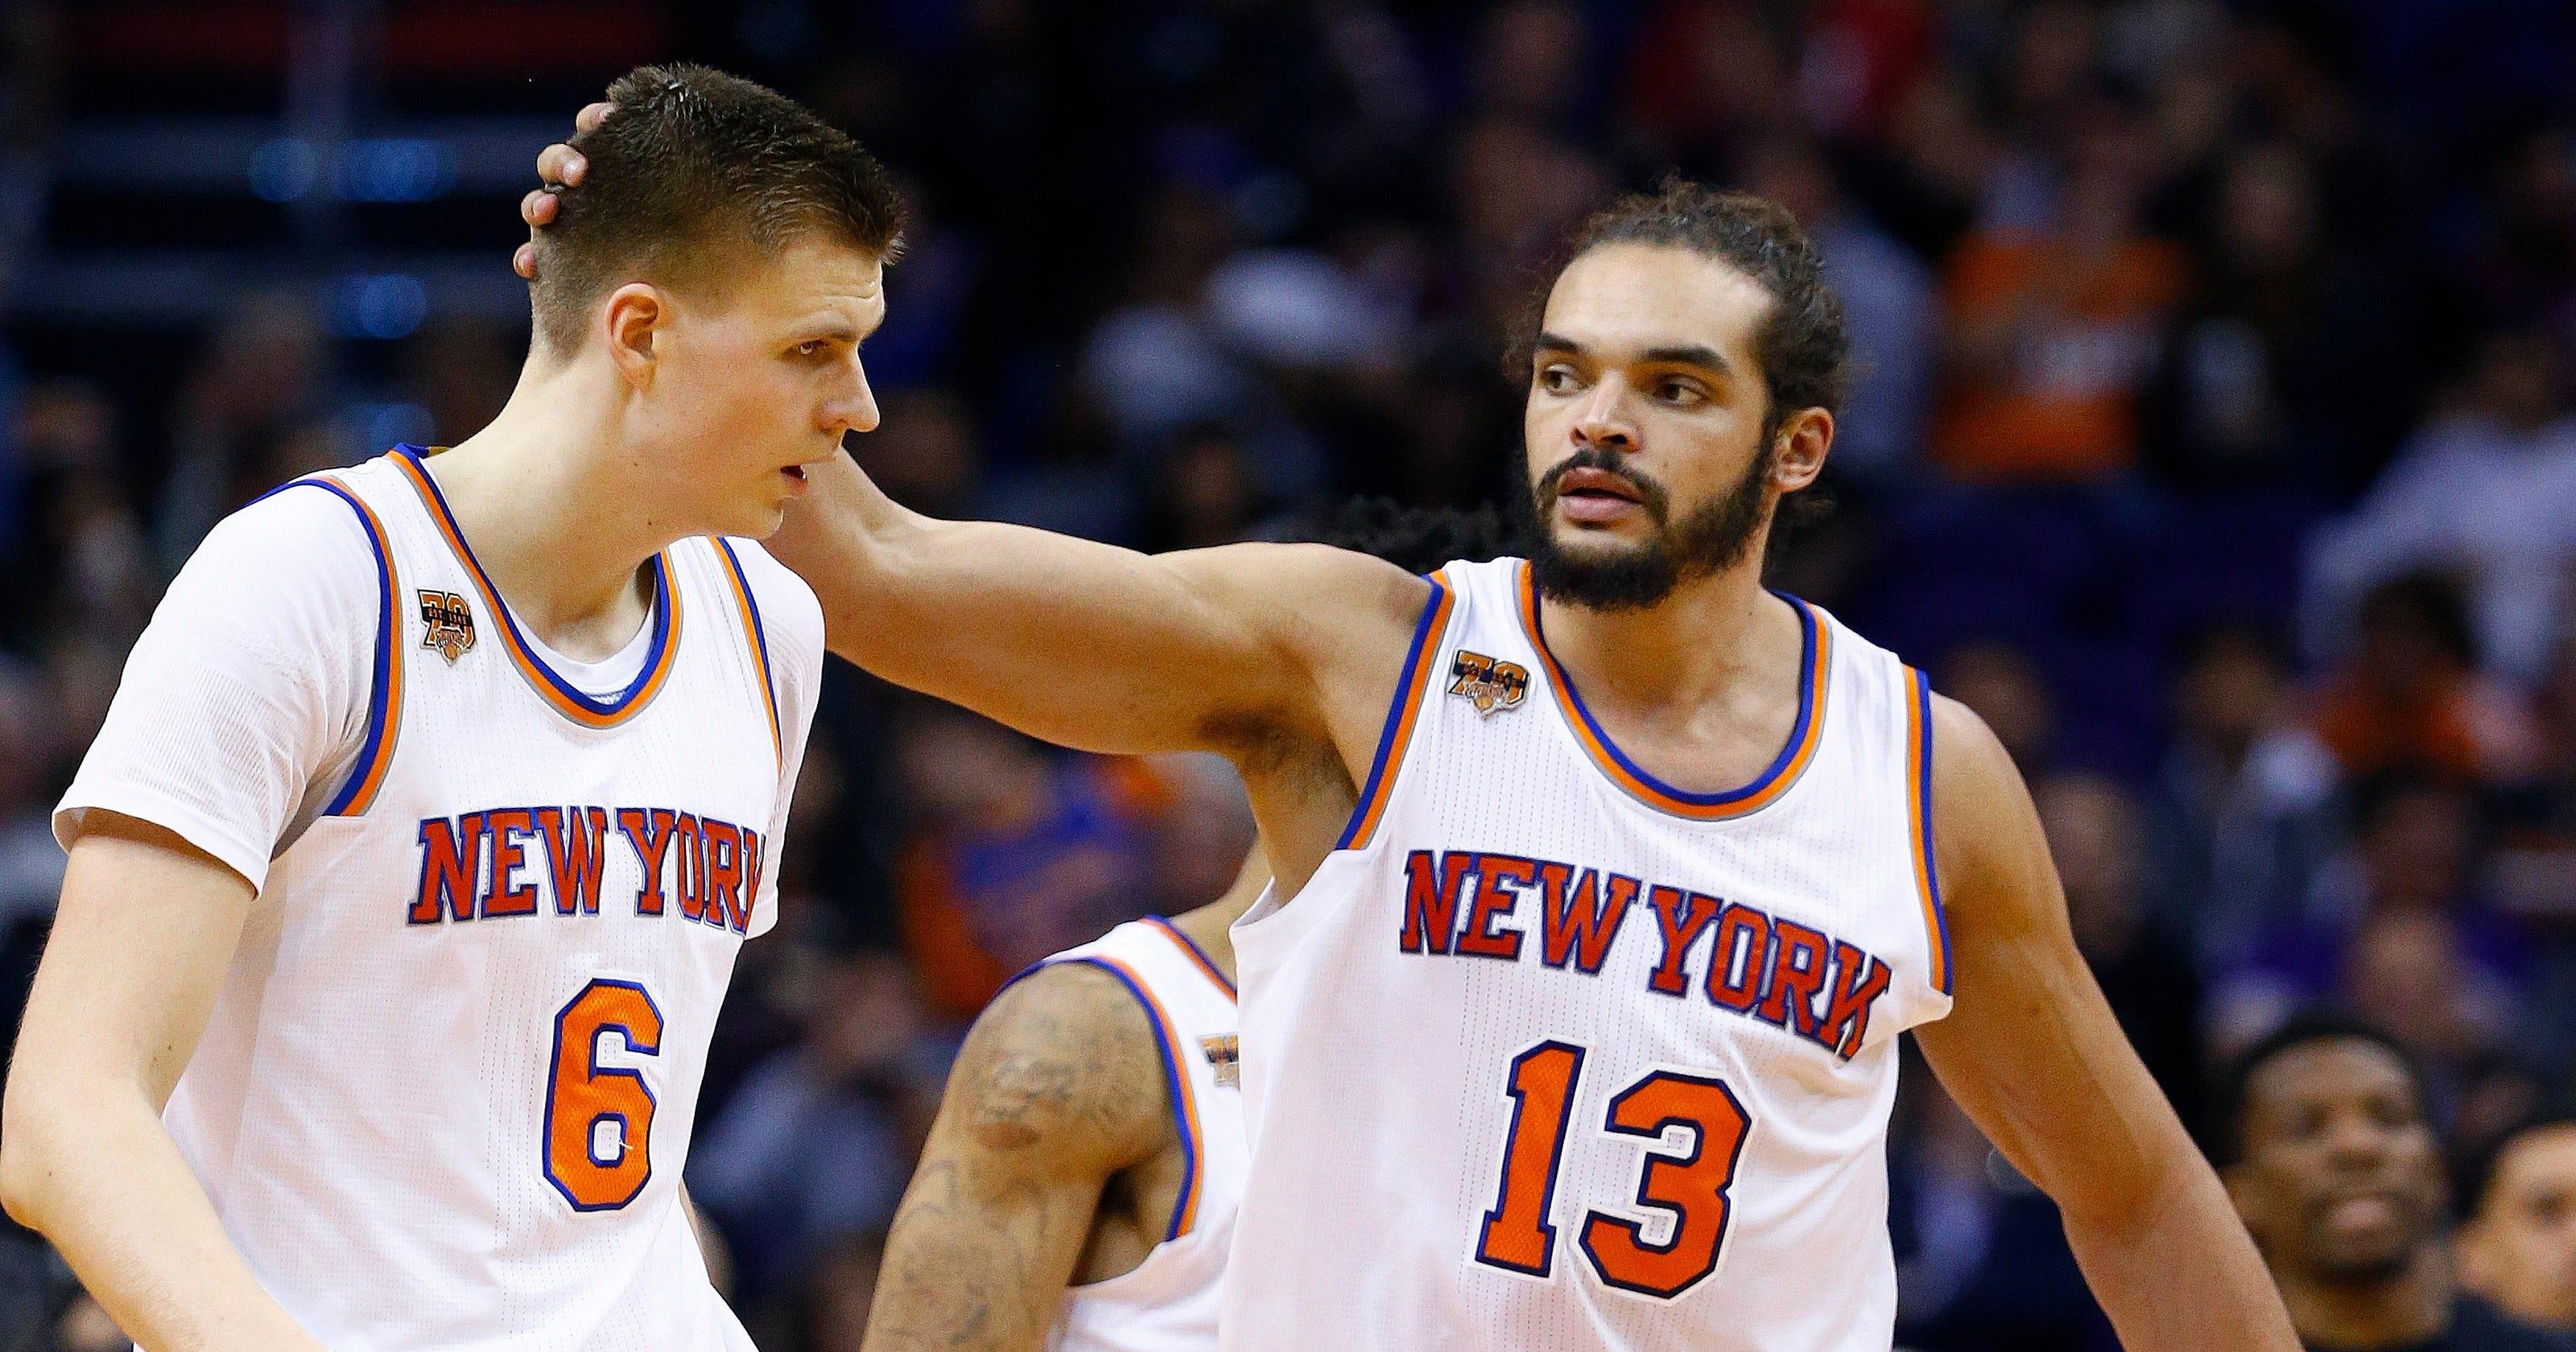 cf32583db83c Knicks feel pain  lose to Suns